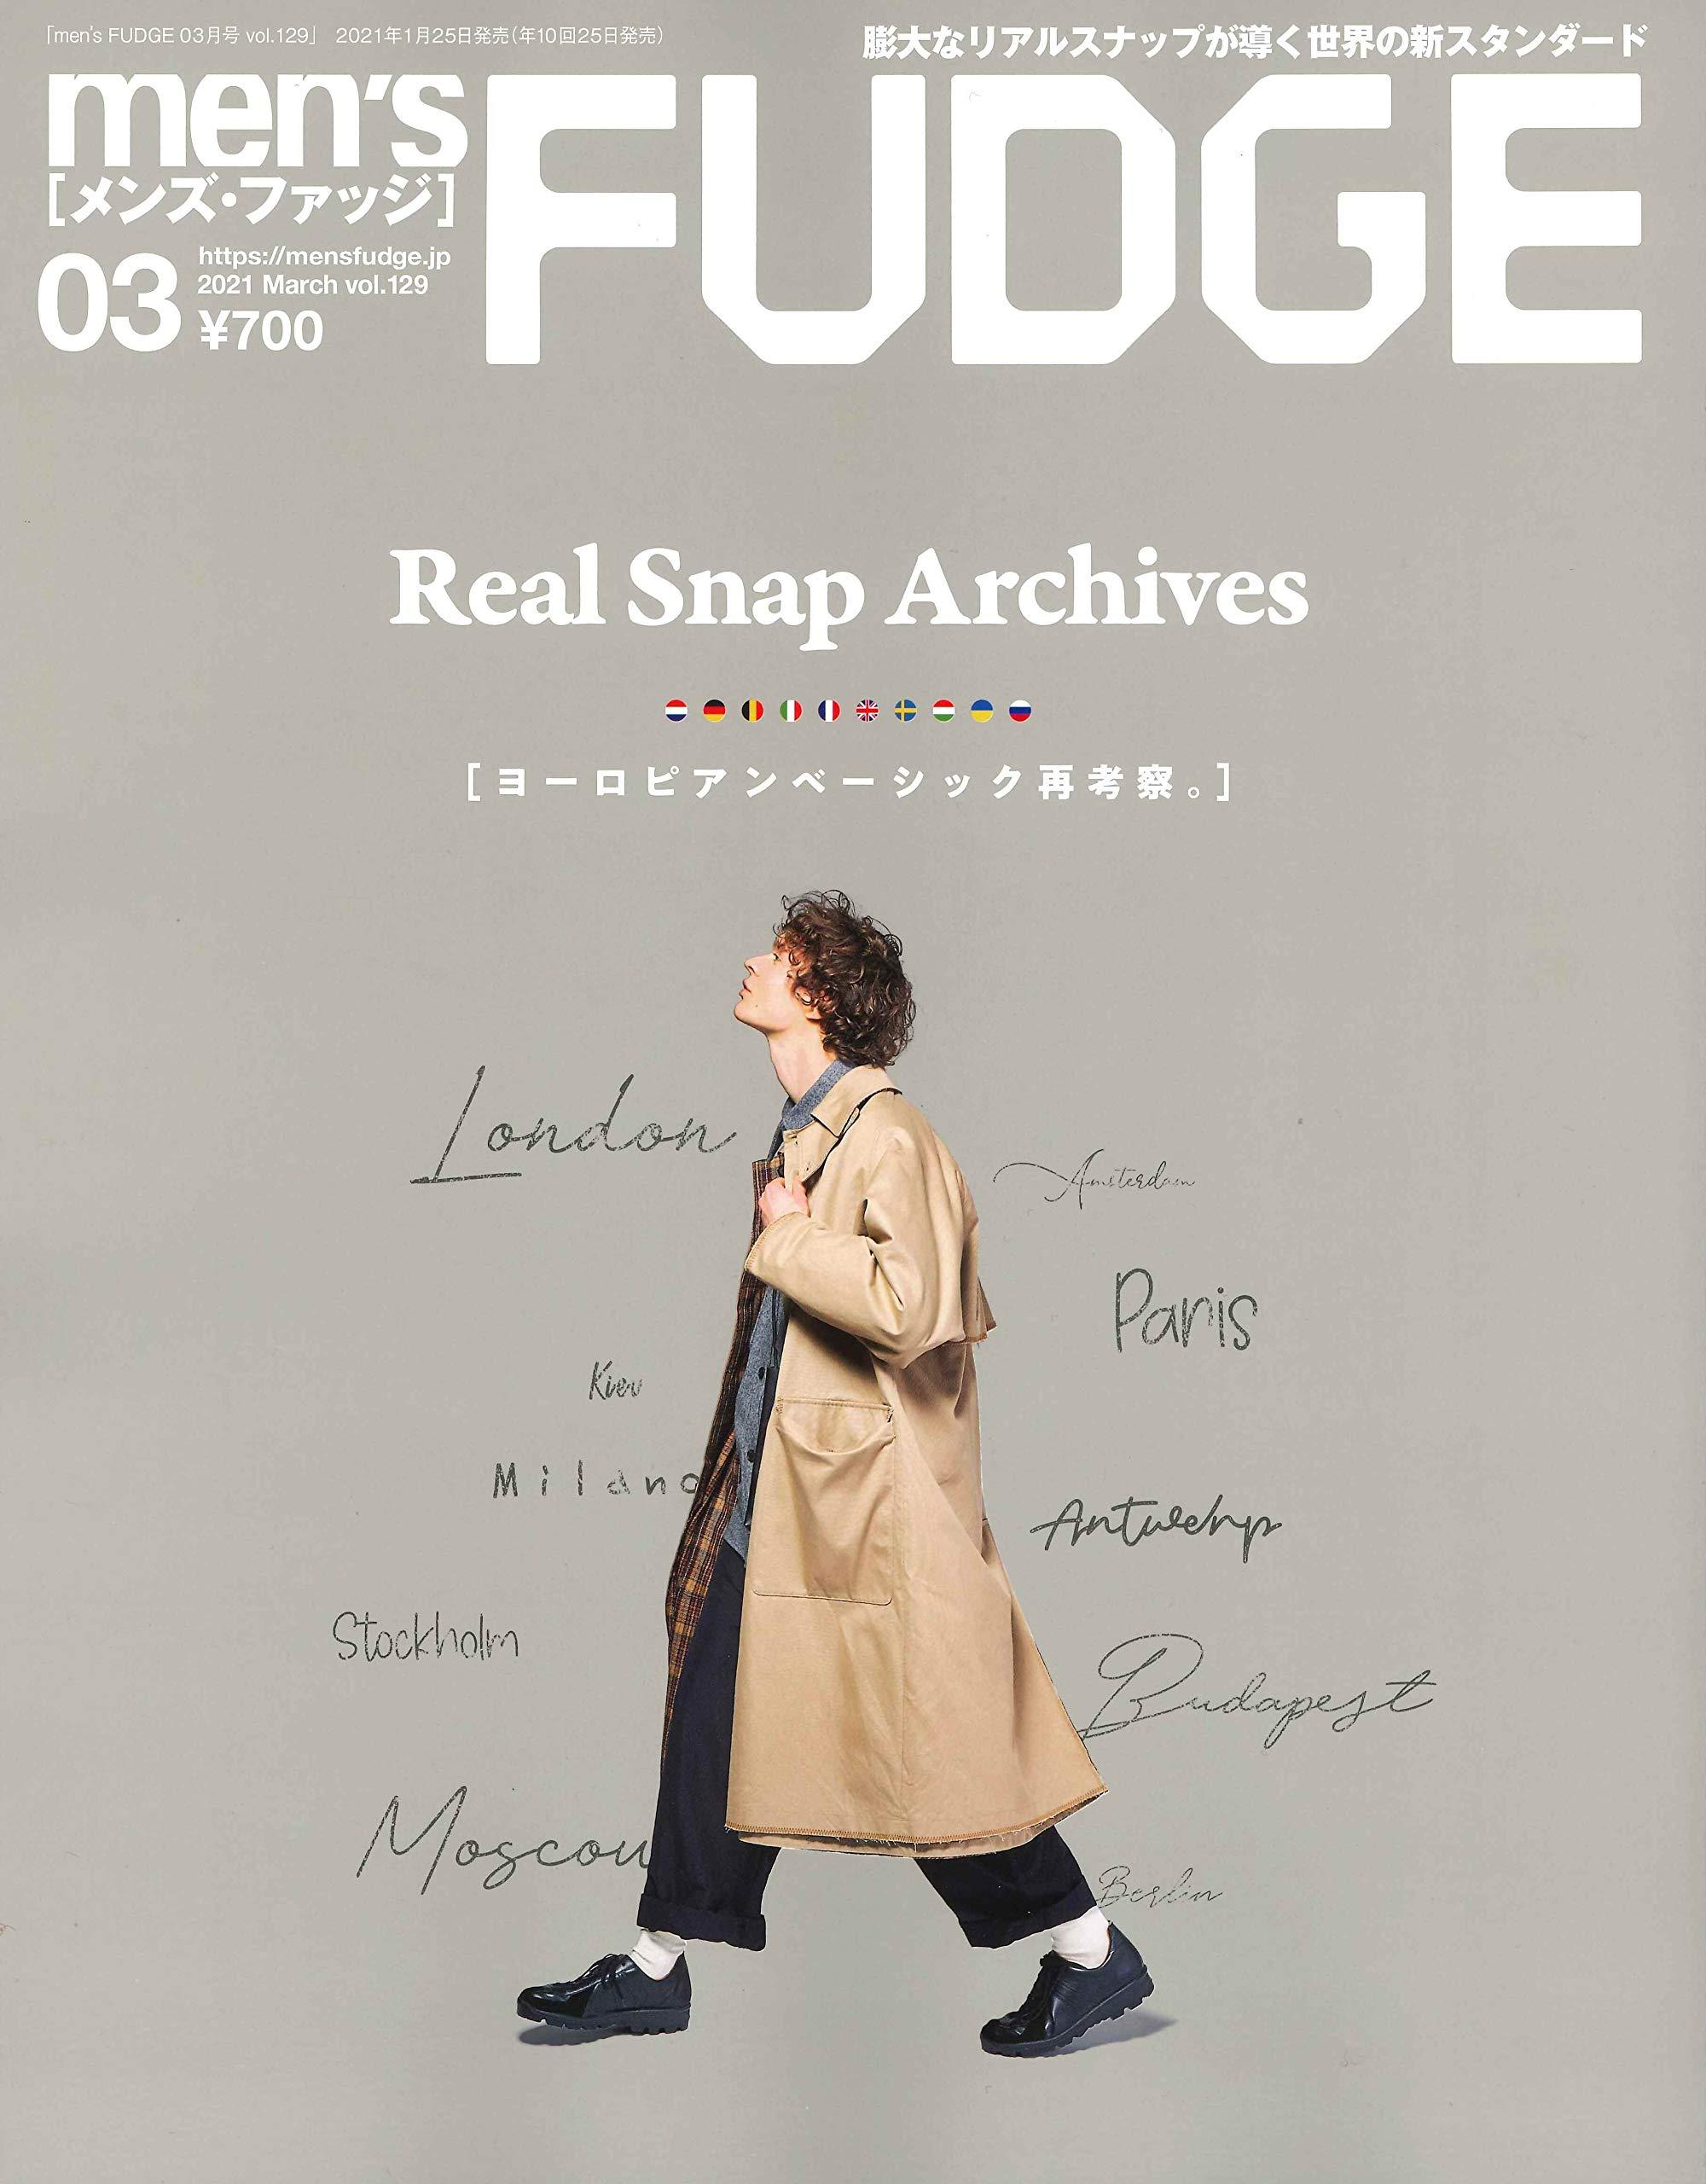 『men's FUDGE』2021年3月号, 三栄書房